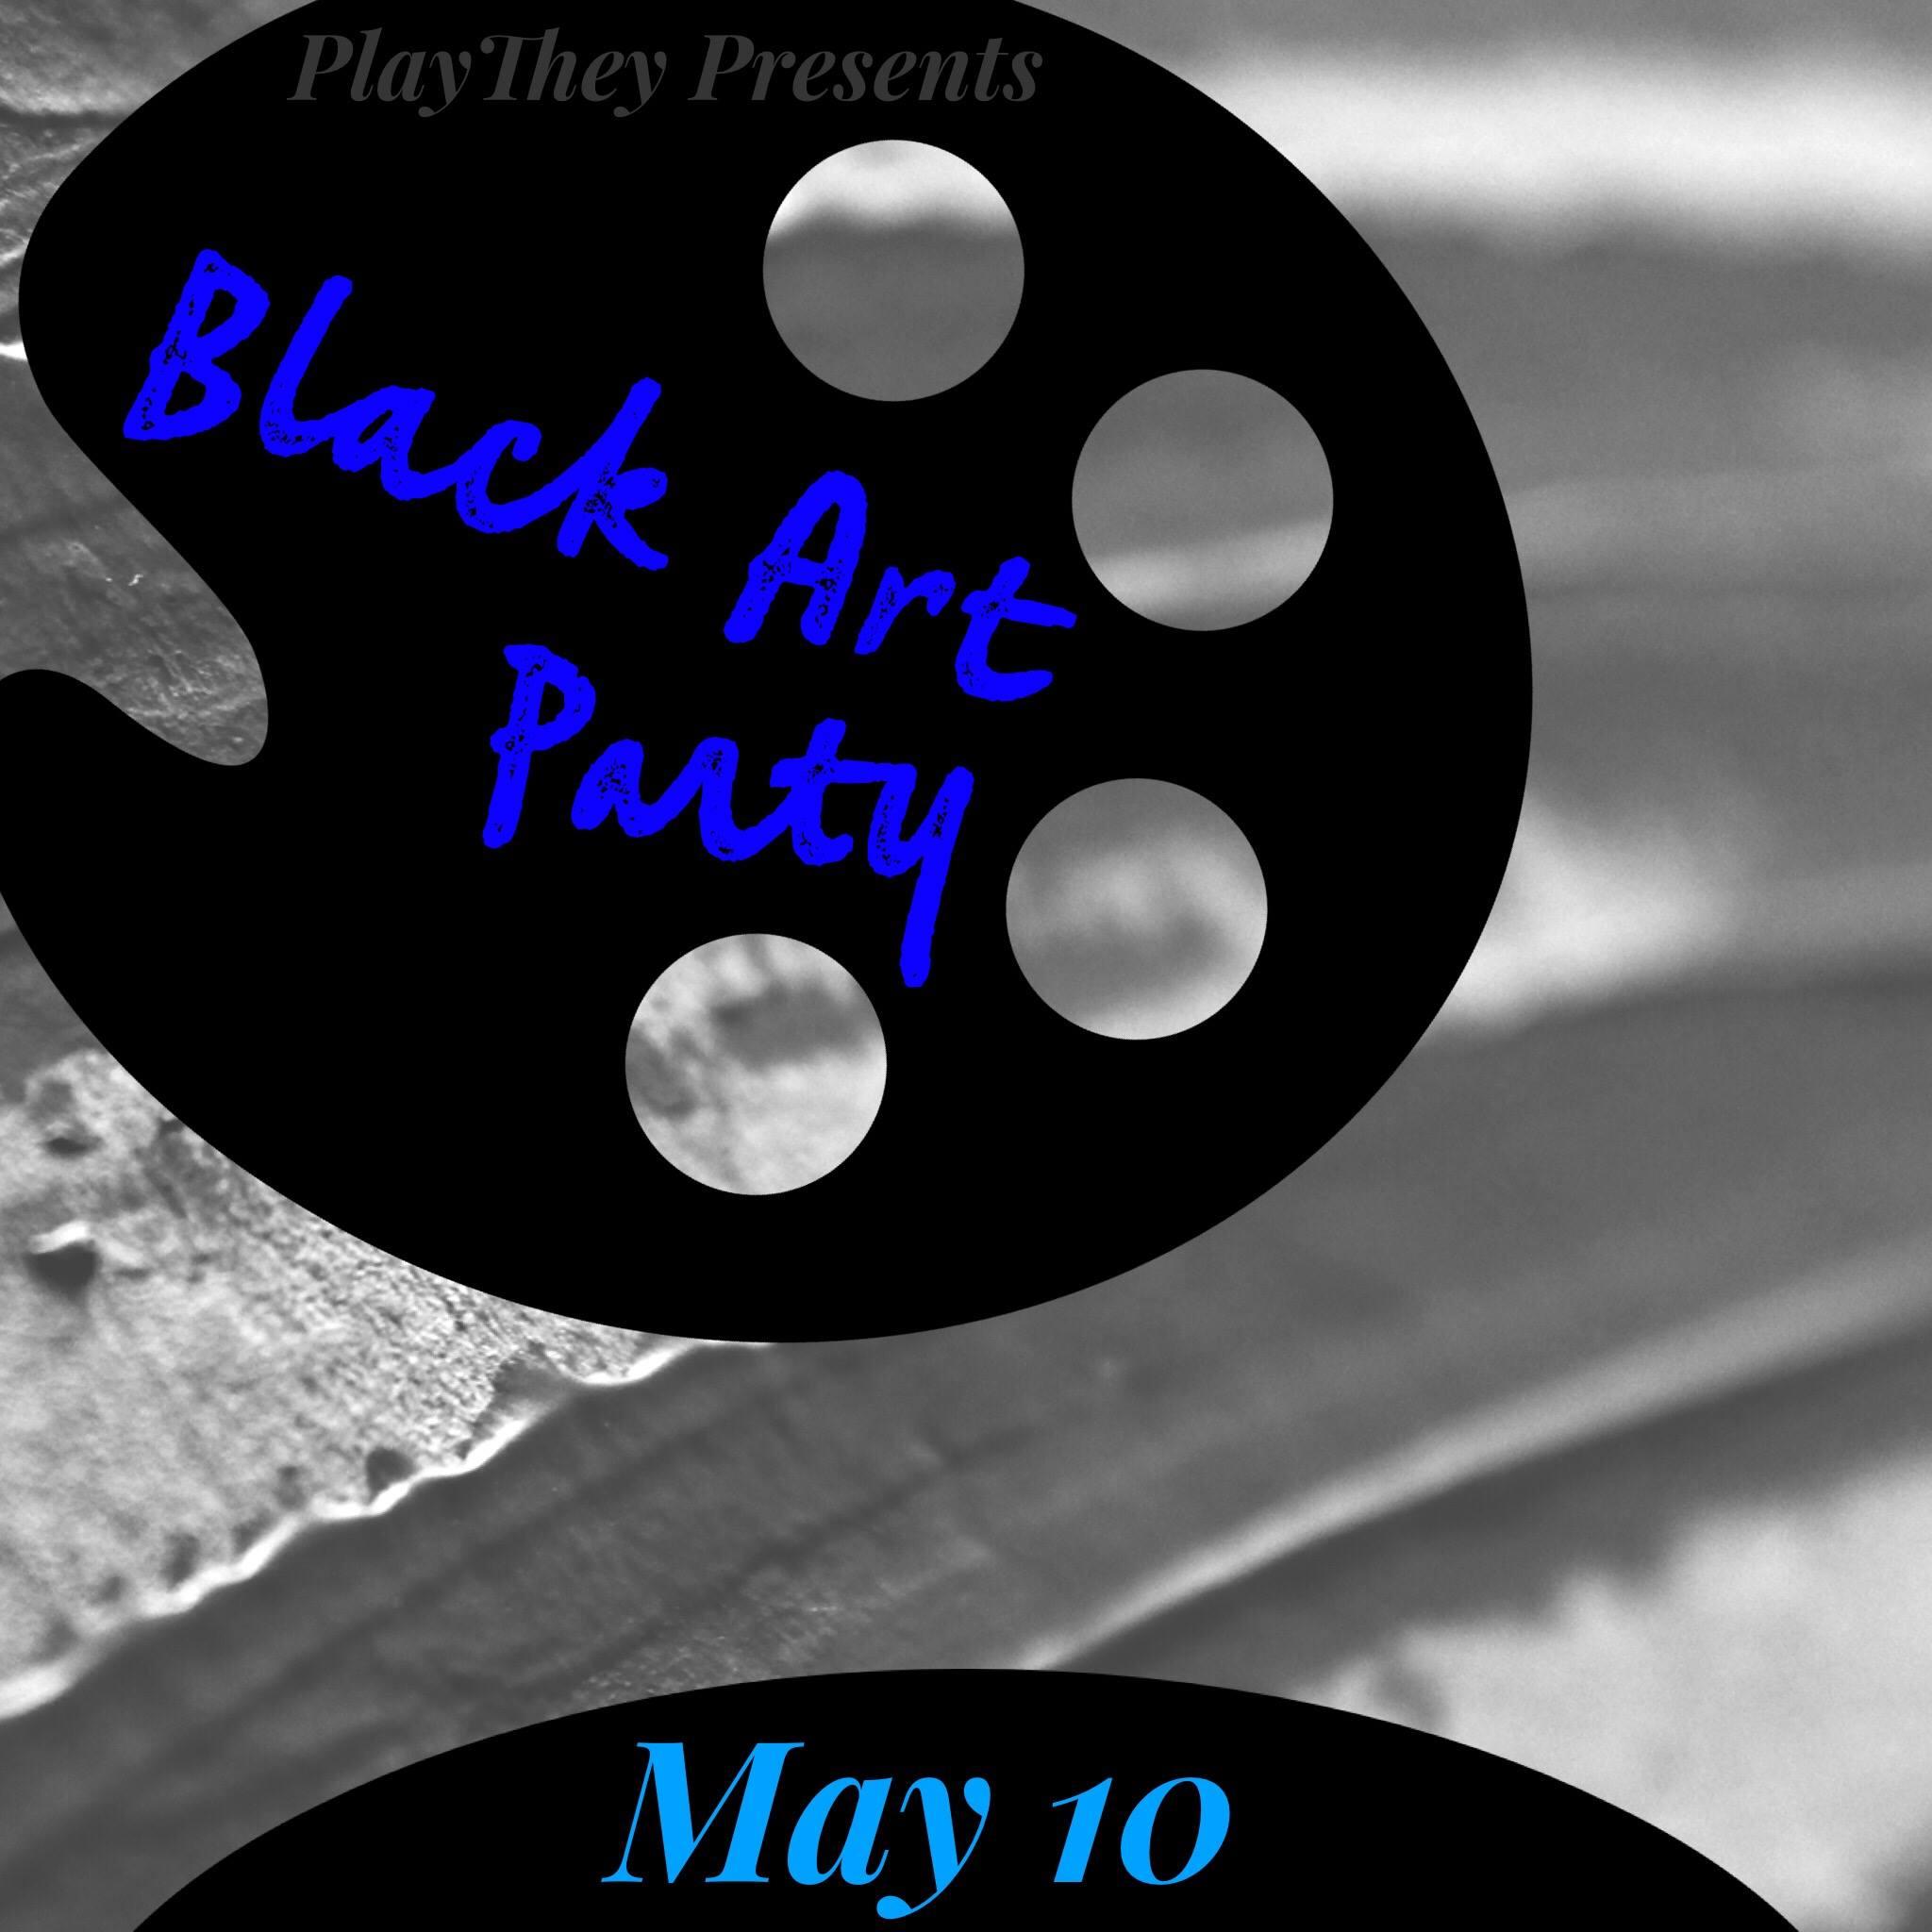 Blackl art party.jpg